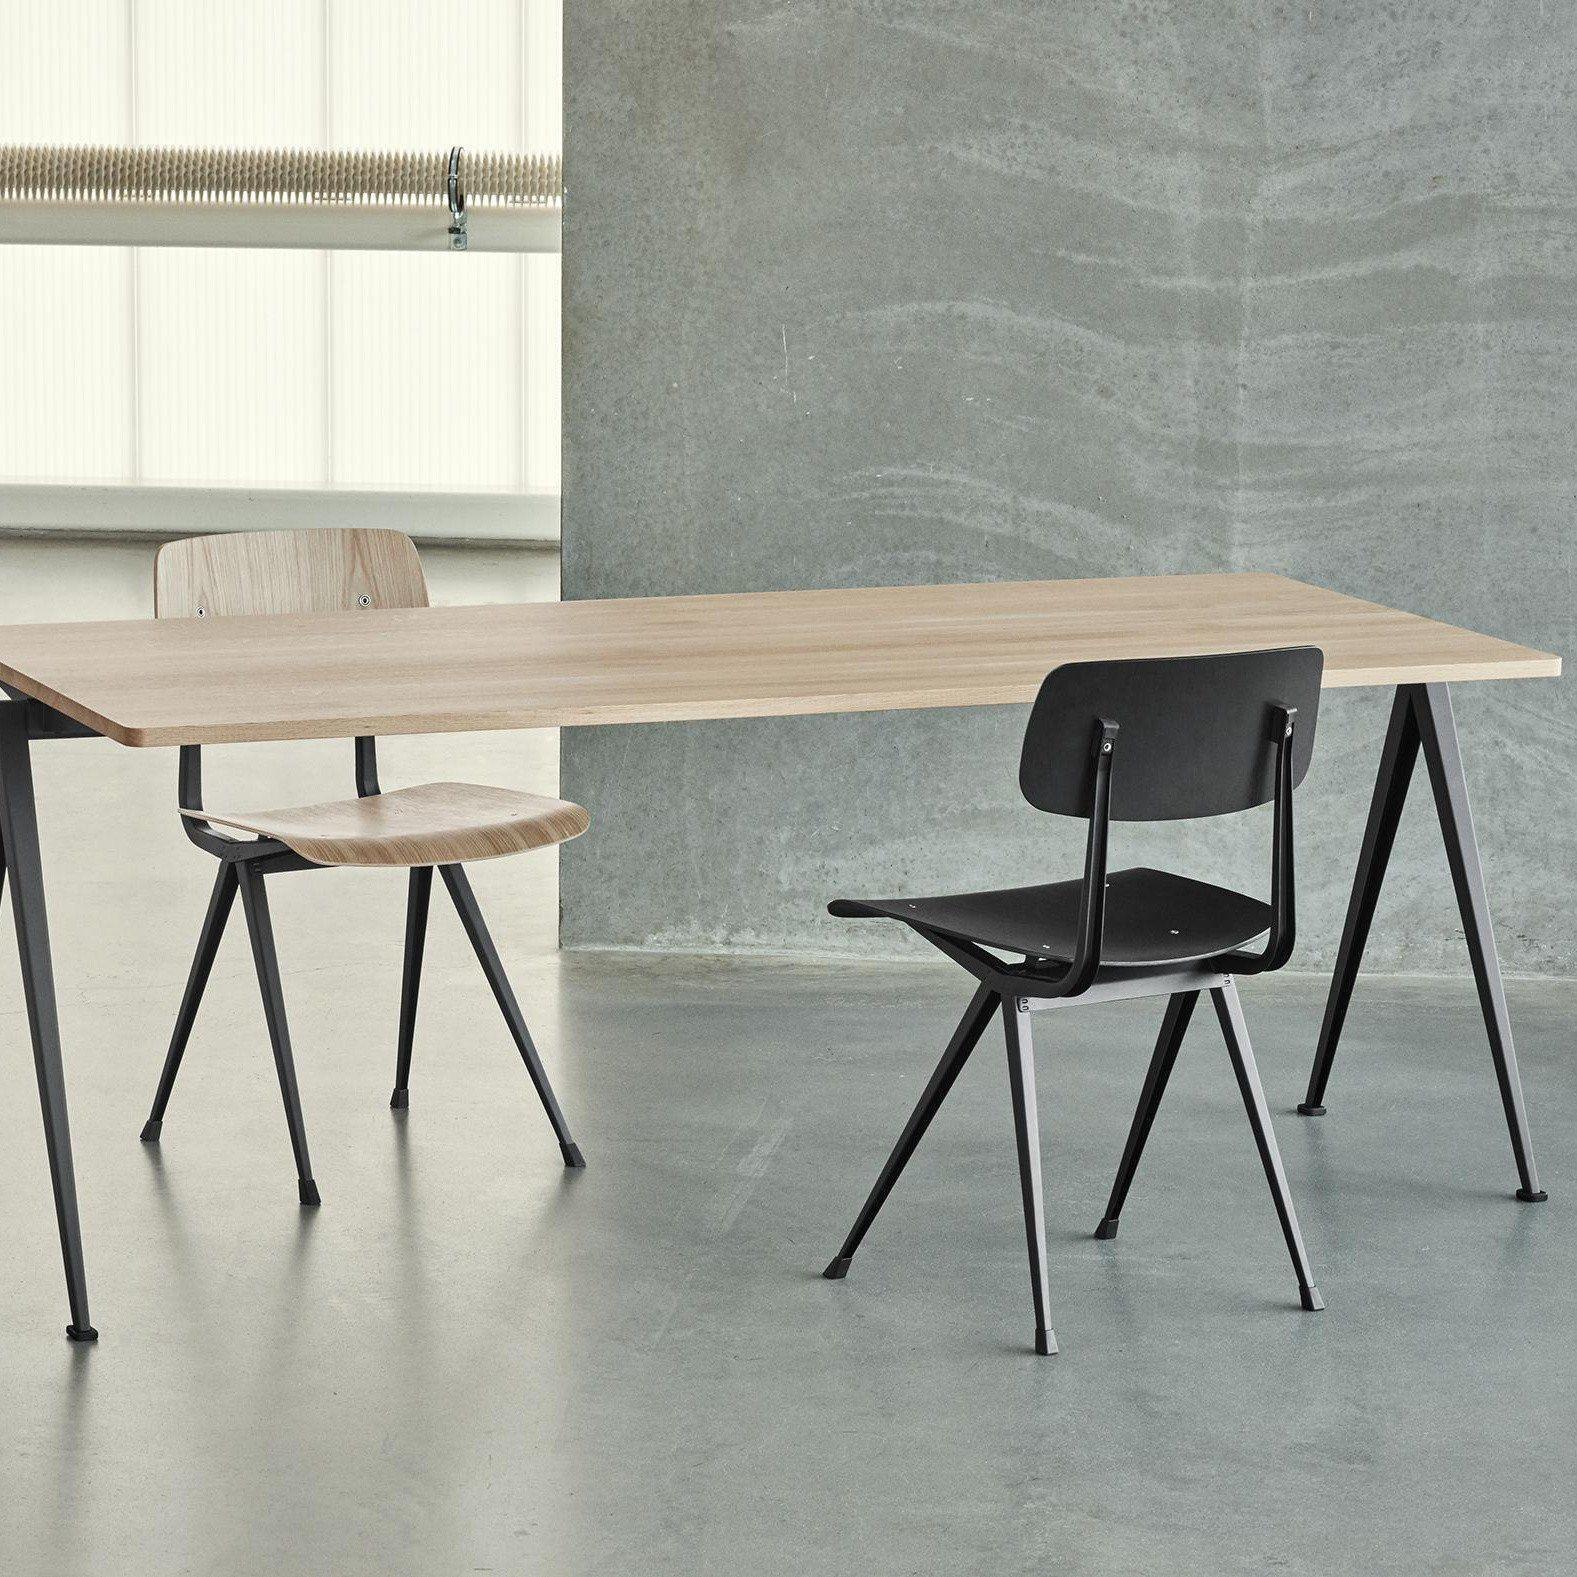 hay pyramid table 02 tisch 190x85cm hay. Black Bedroom Furniture Sets. Home Design Ideas